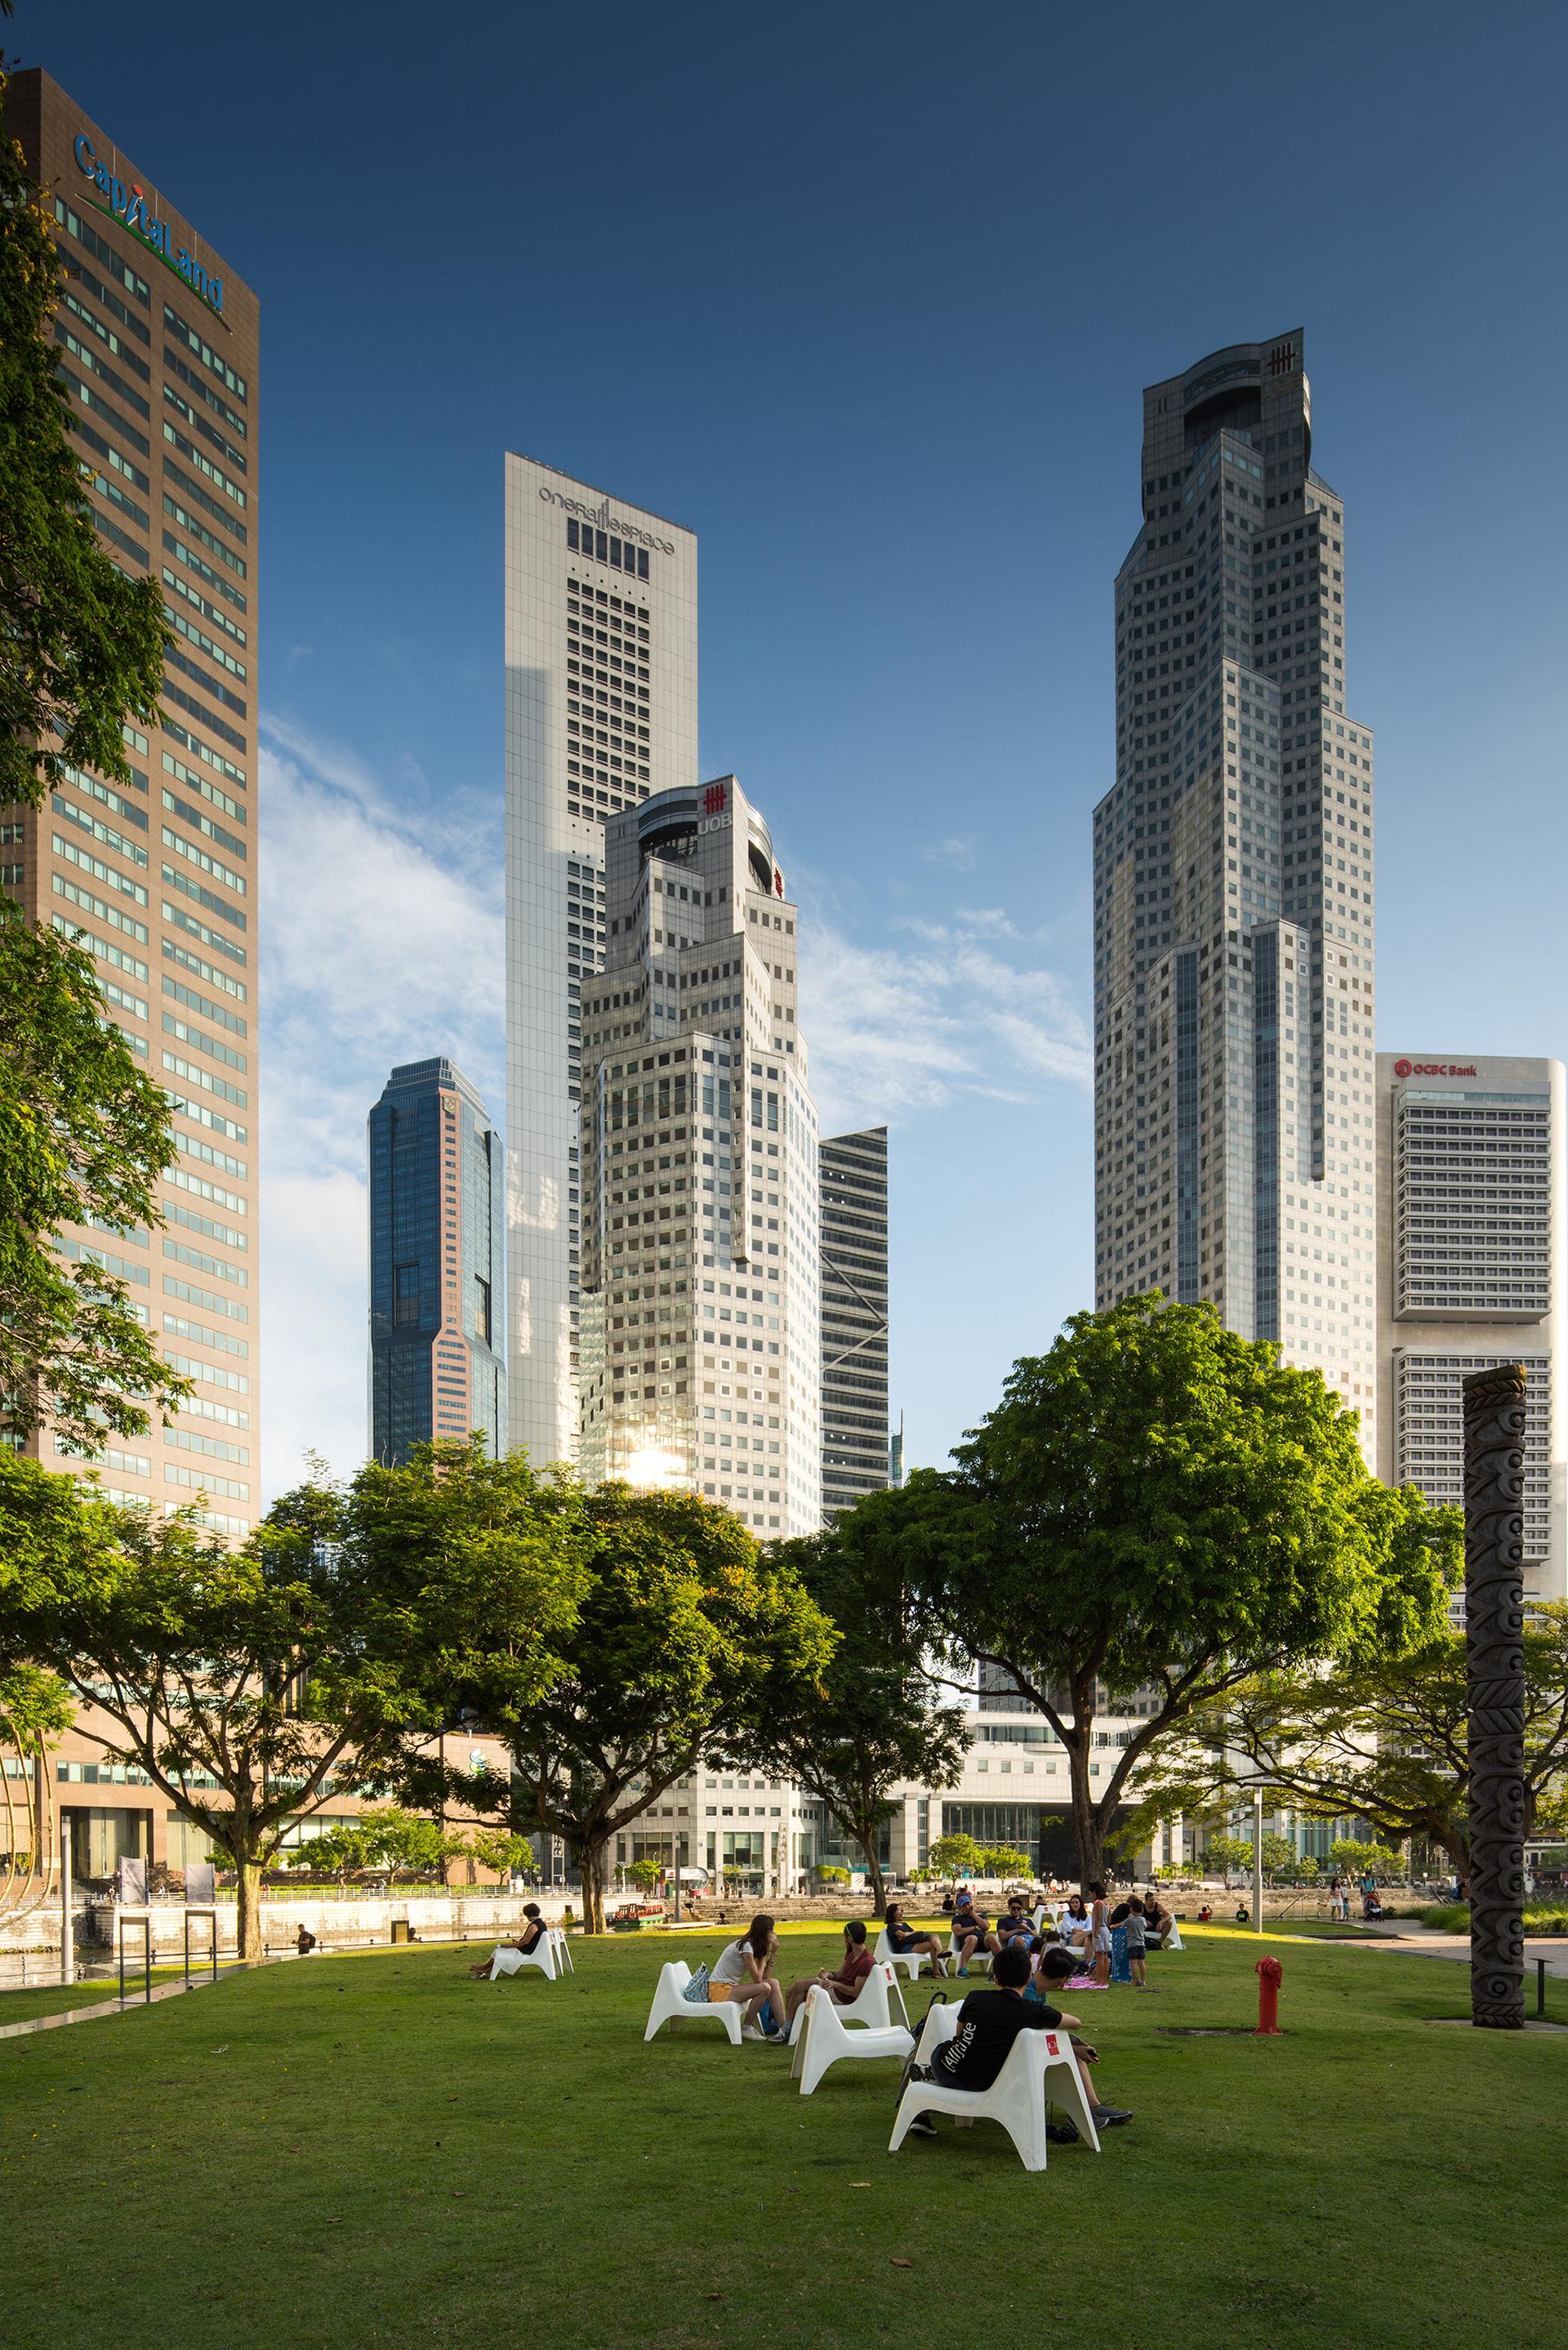 Photography: Exploring Singapore Day & Night